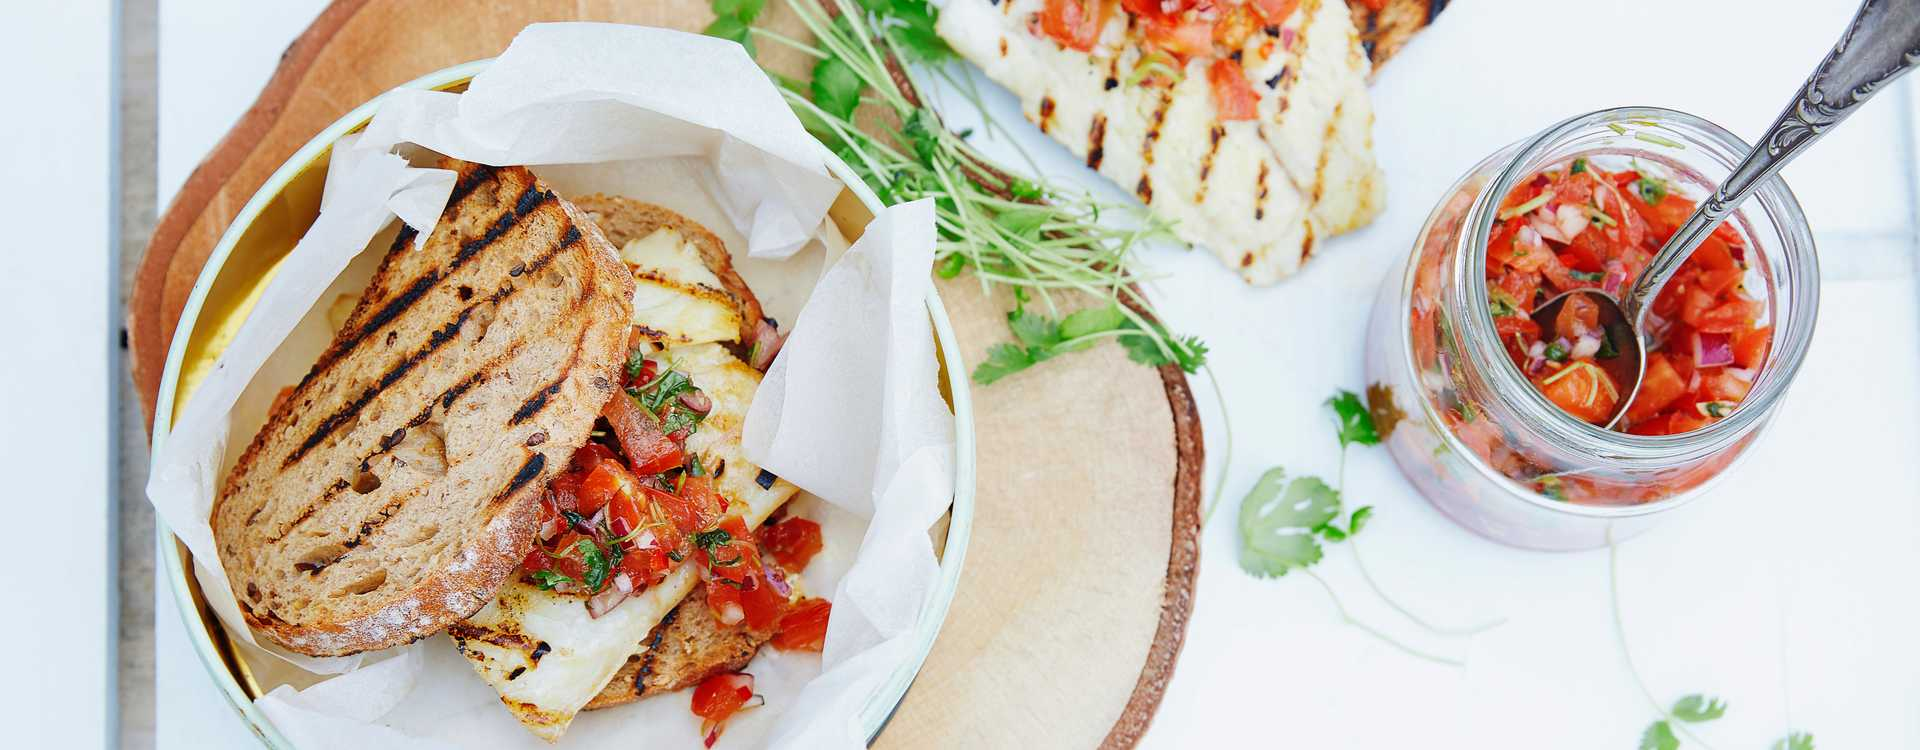 Grillet klippfisk med tomatsalsa